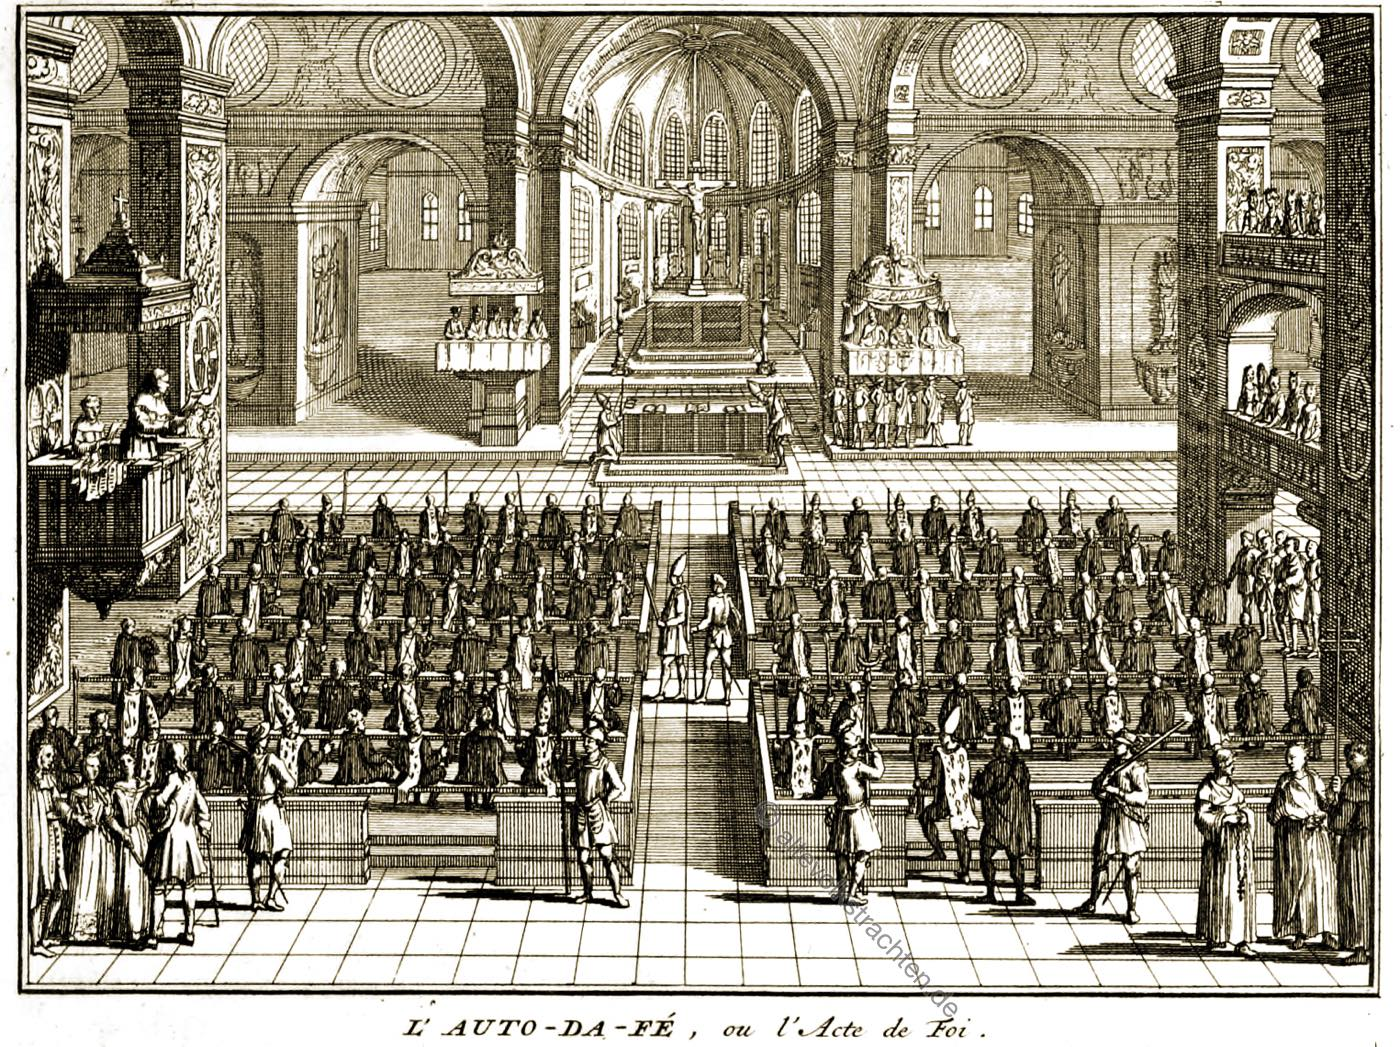 auto-da-fe, autodafe, Autodafé, Inquisition, Bernard Picart, Urteil,